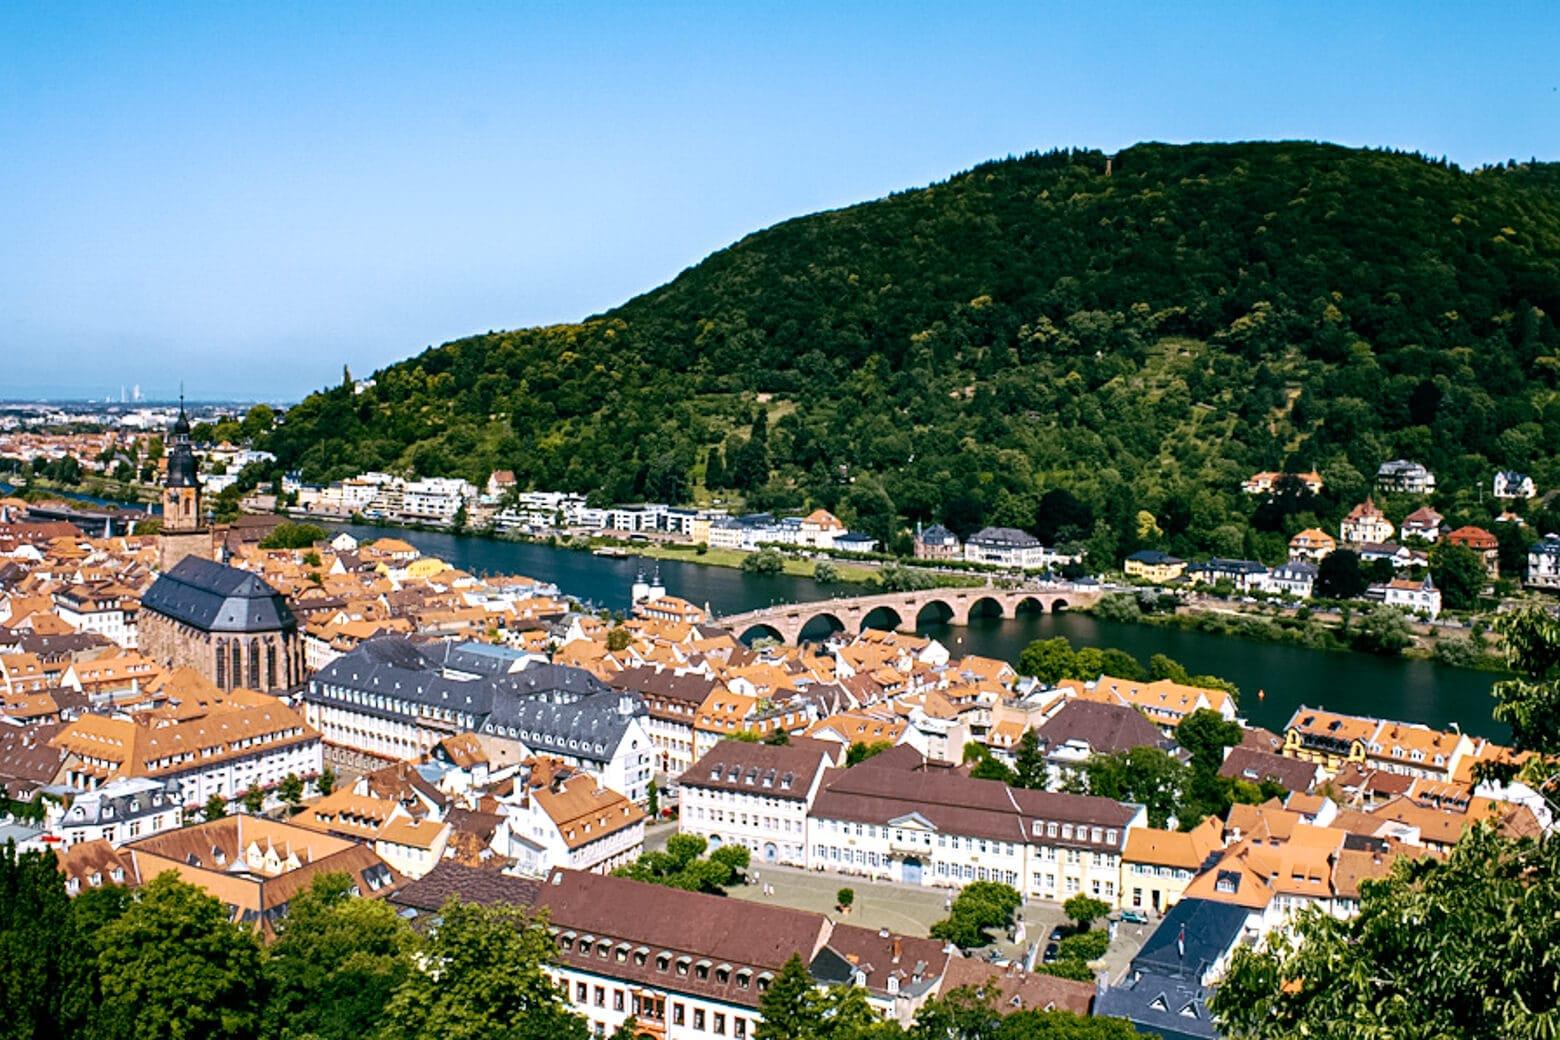 Views from Heidelberg Castle